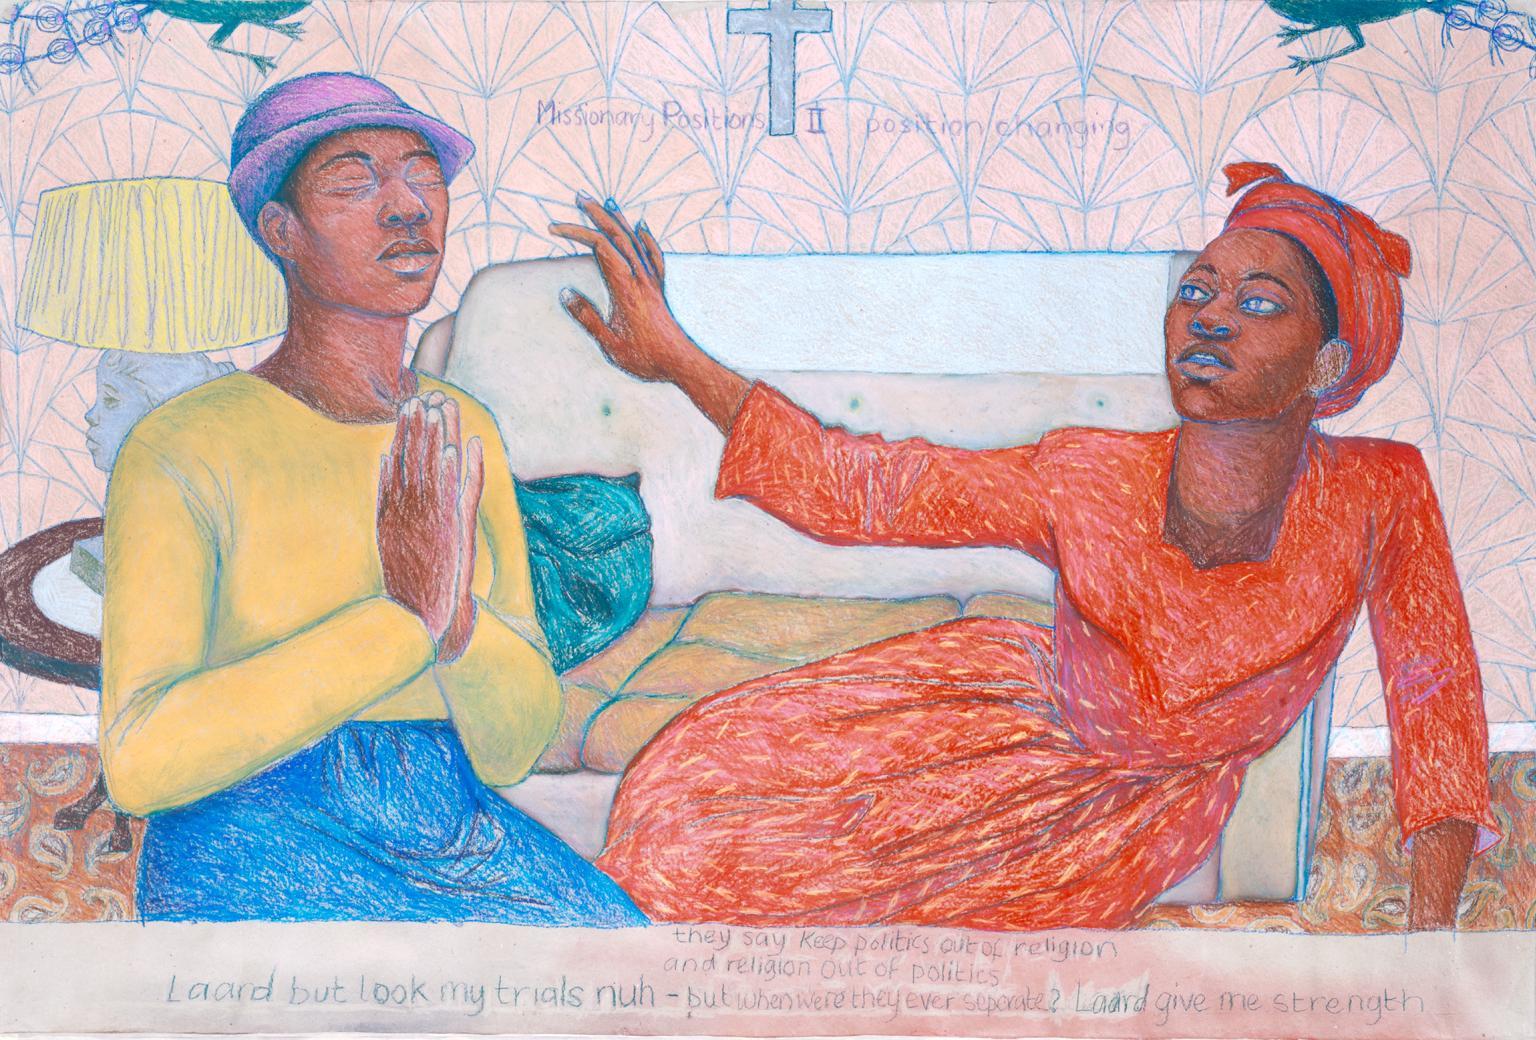 ' Missionary Position II ' 1985 by Sonia Boyce